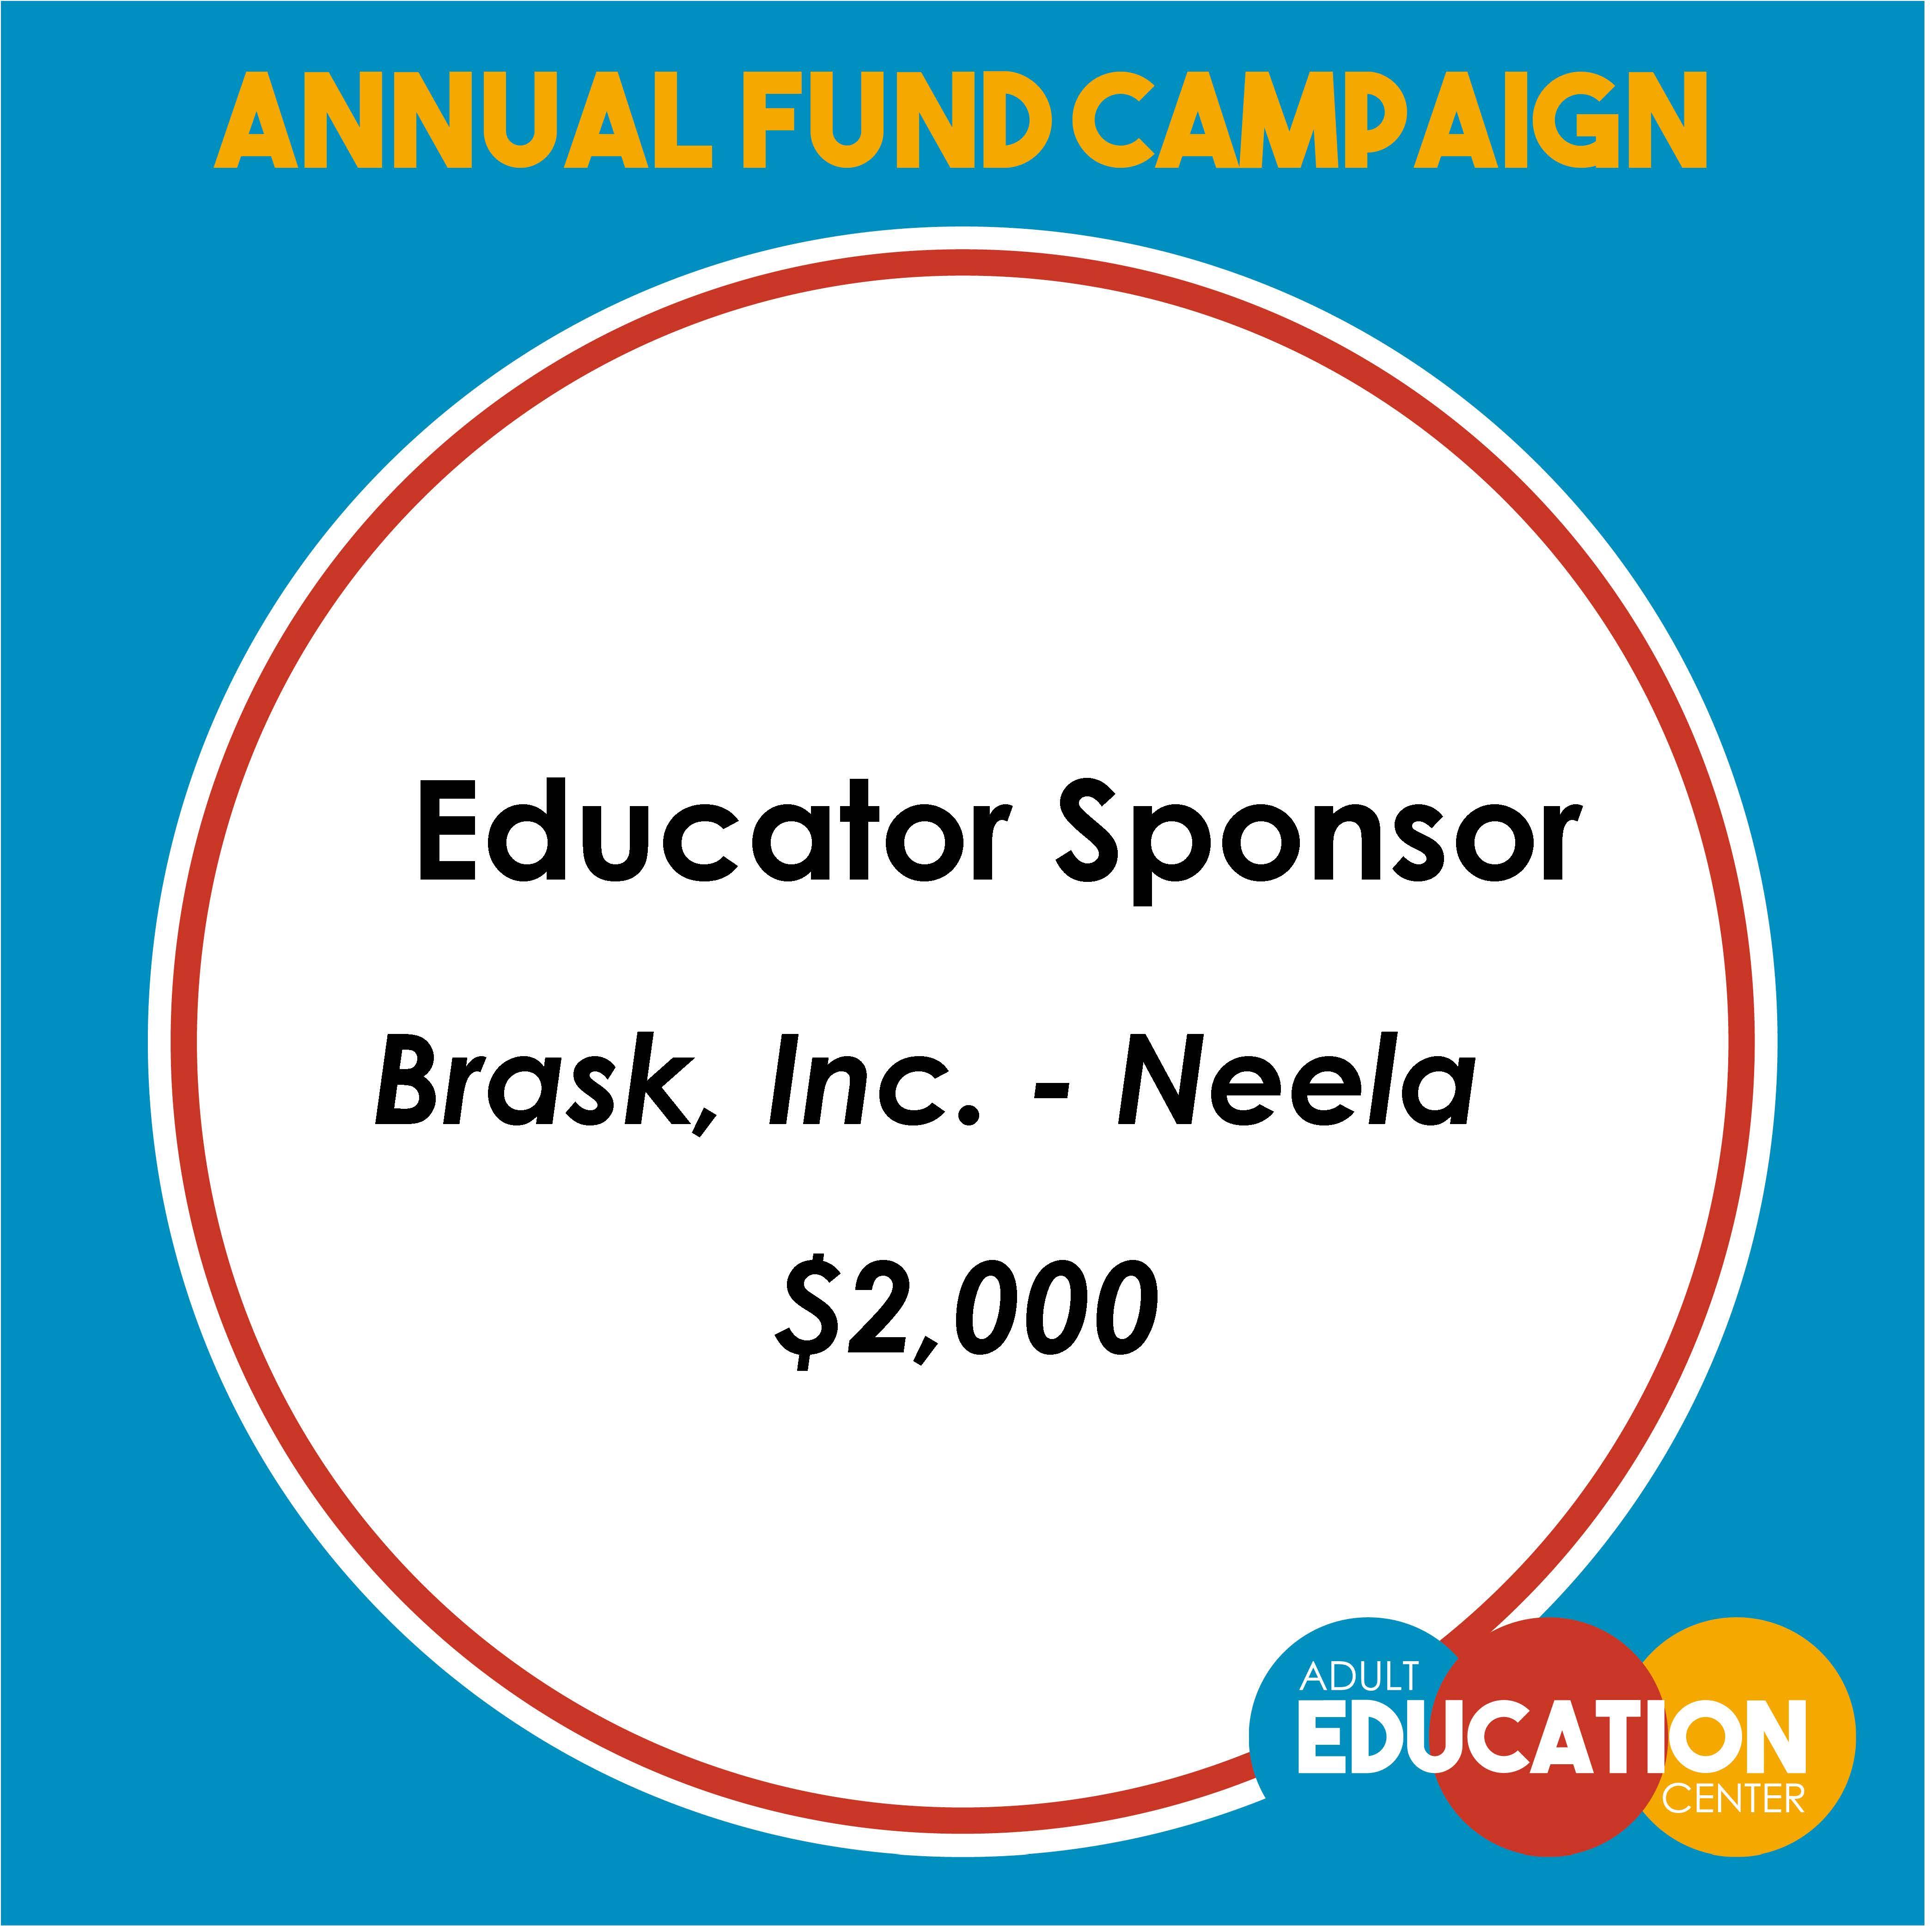 Brask, Inc. - Neela Educator Sponsor - $1,000